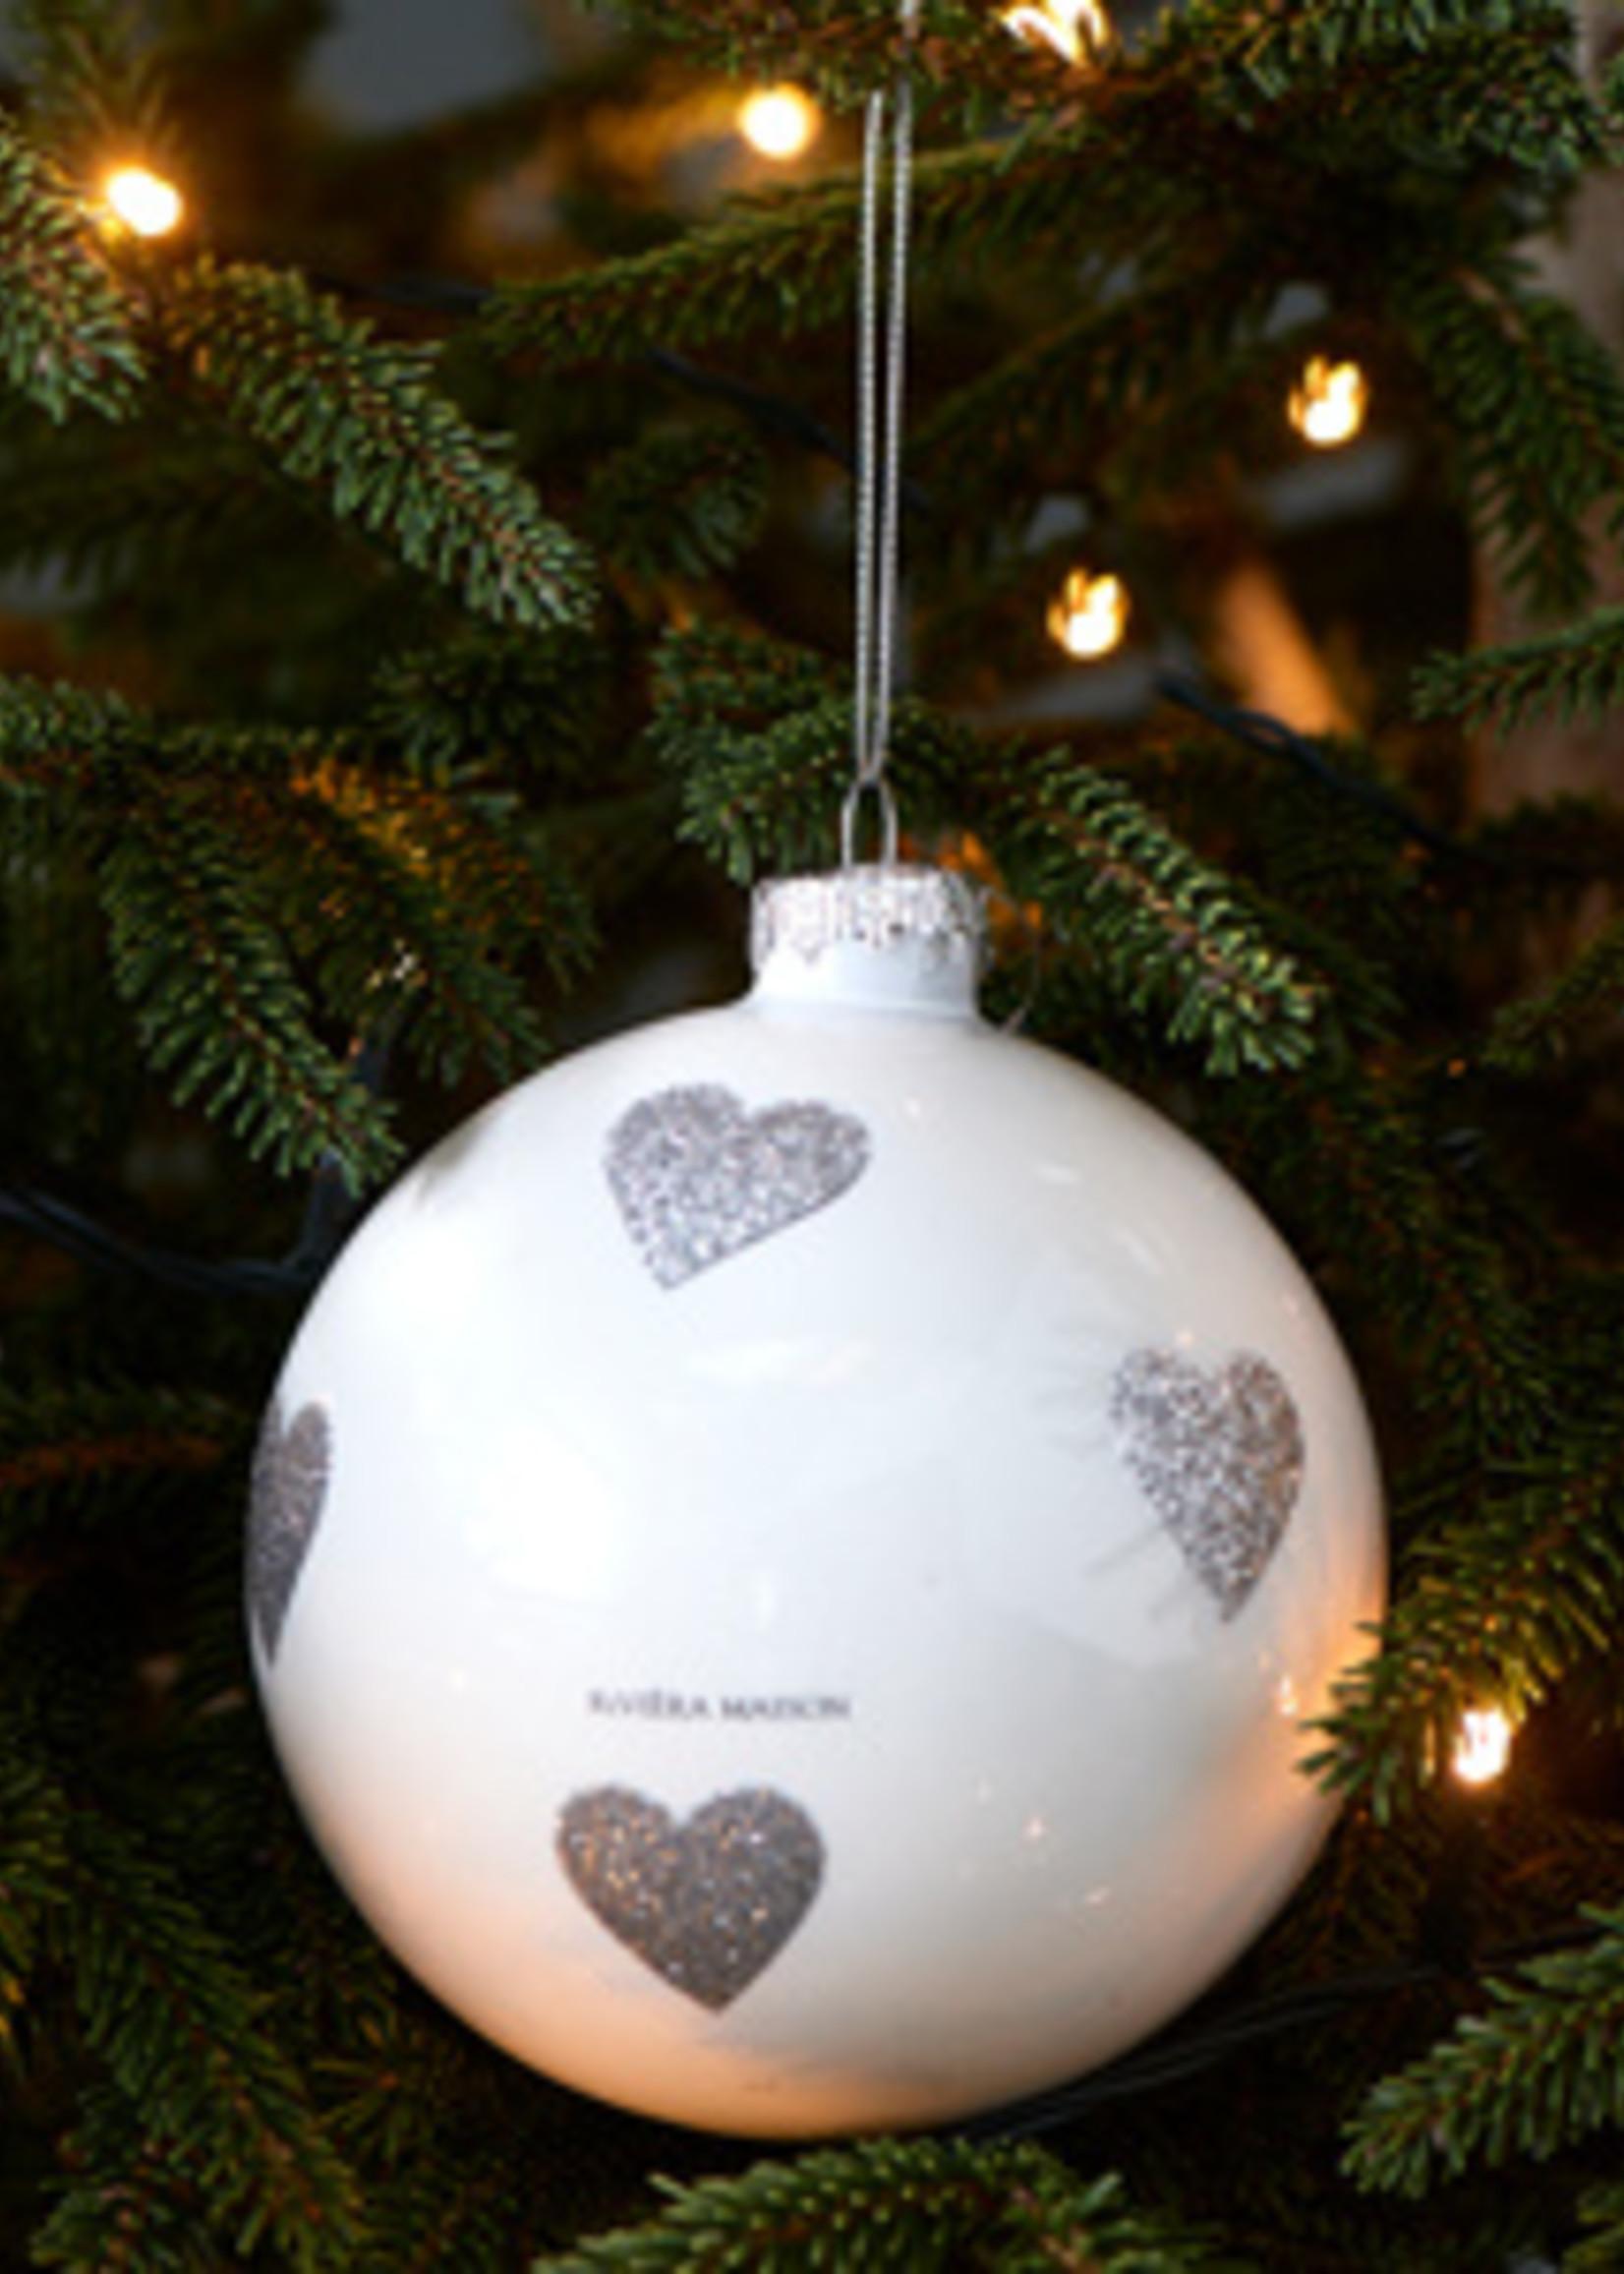 Riviera Maison Lovely Hearts Ornament white Dia 10